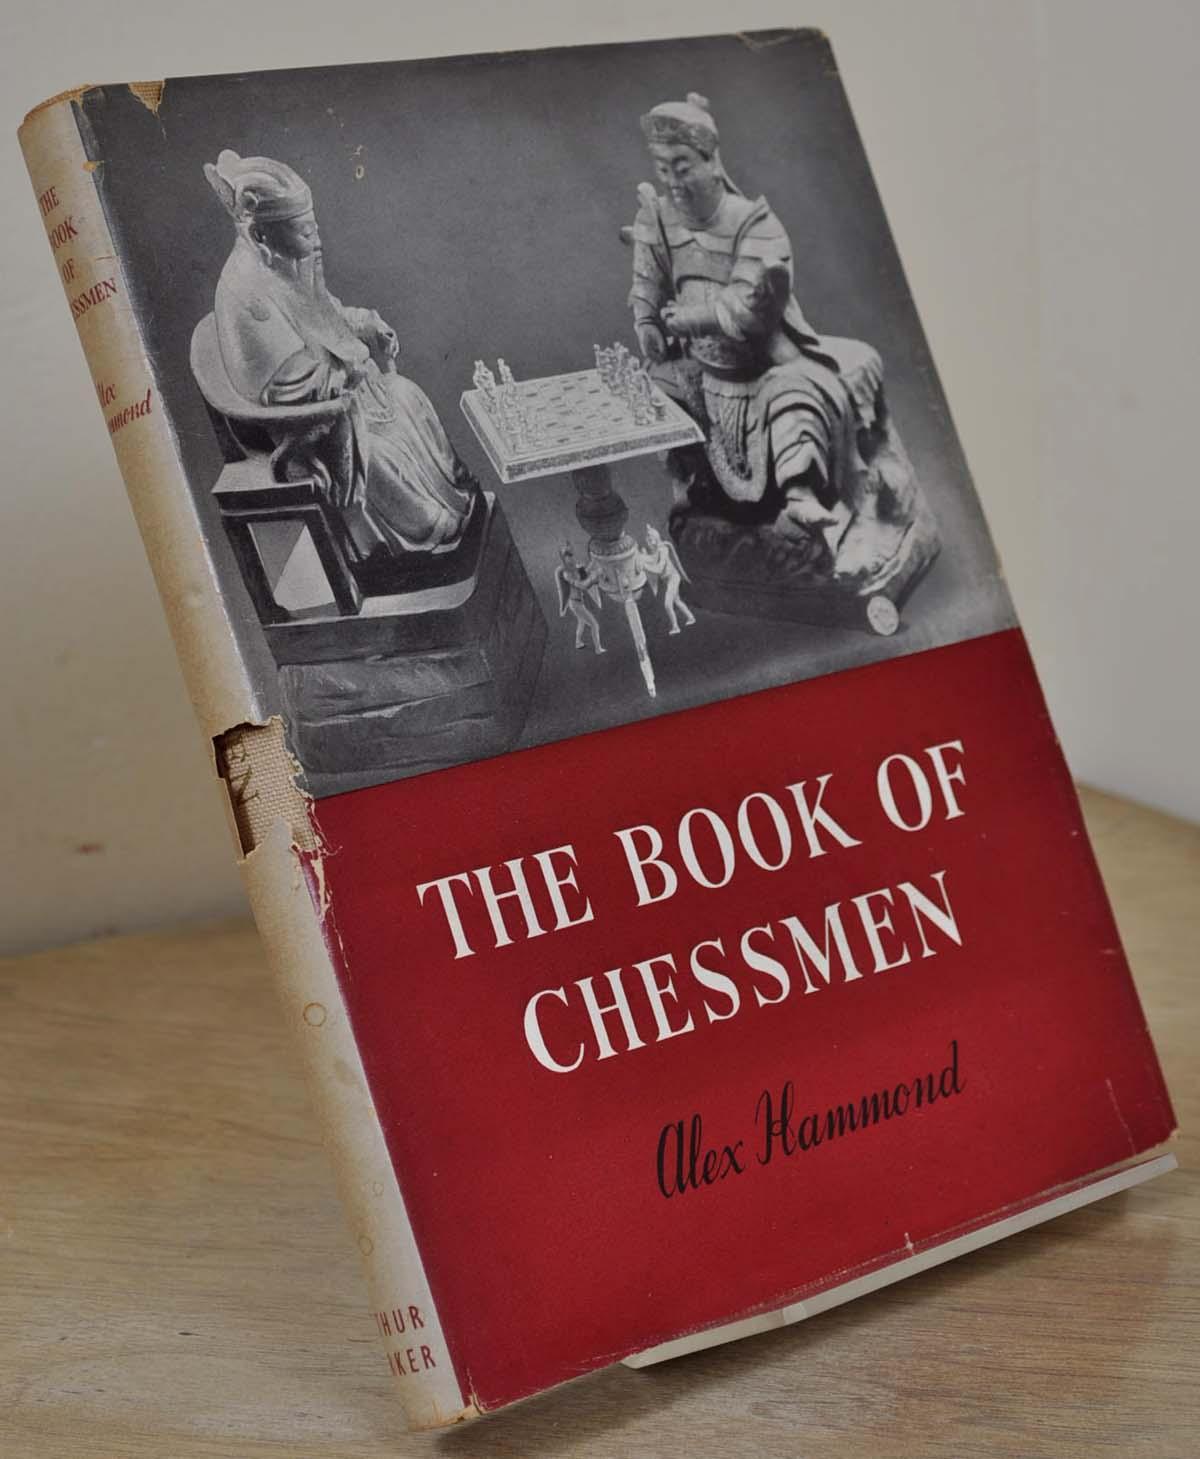 The Book of Chessmen, Alexander Hammond, Arthur Barker Ltd., London, 1950